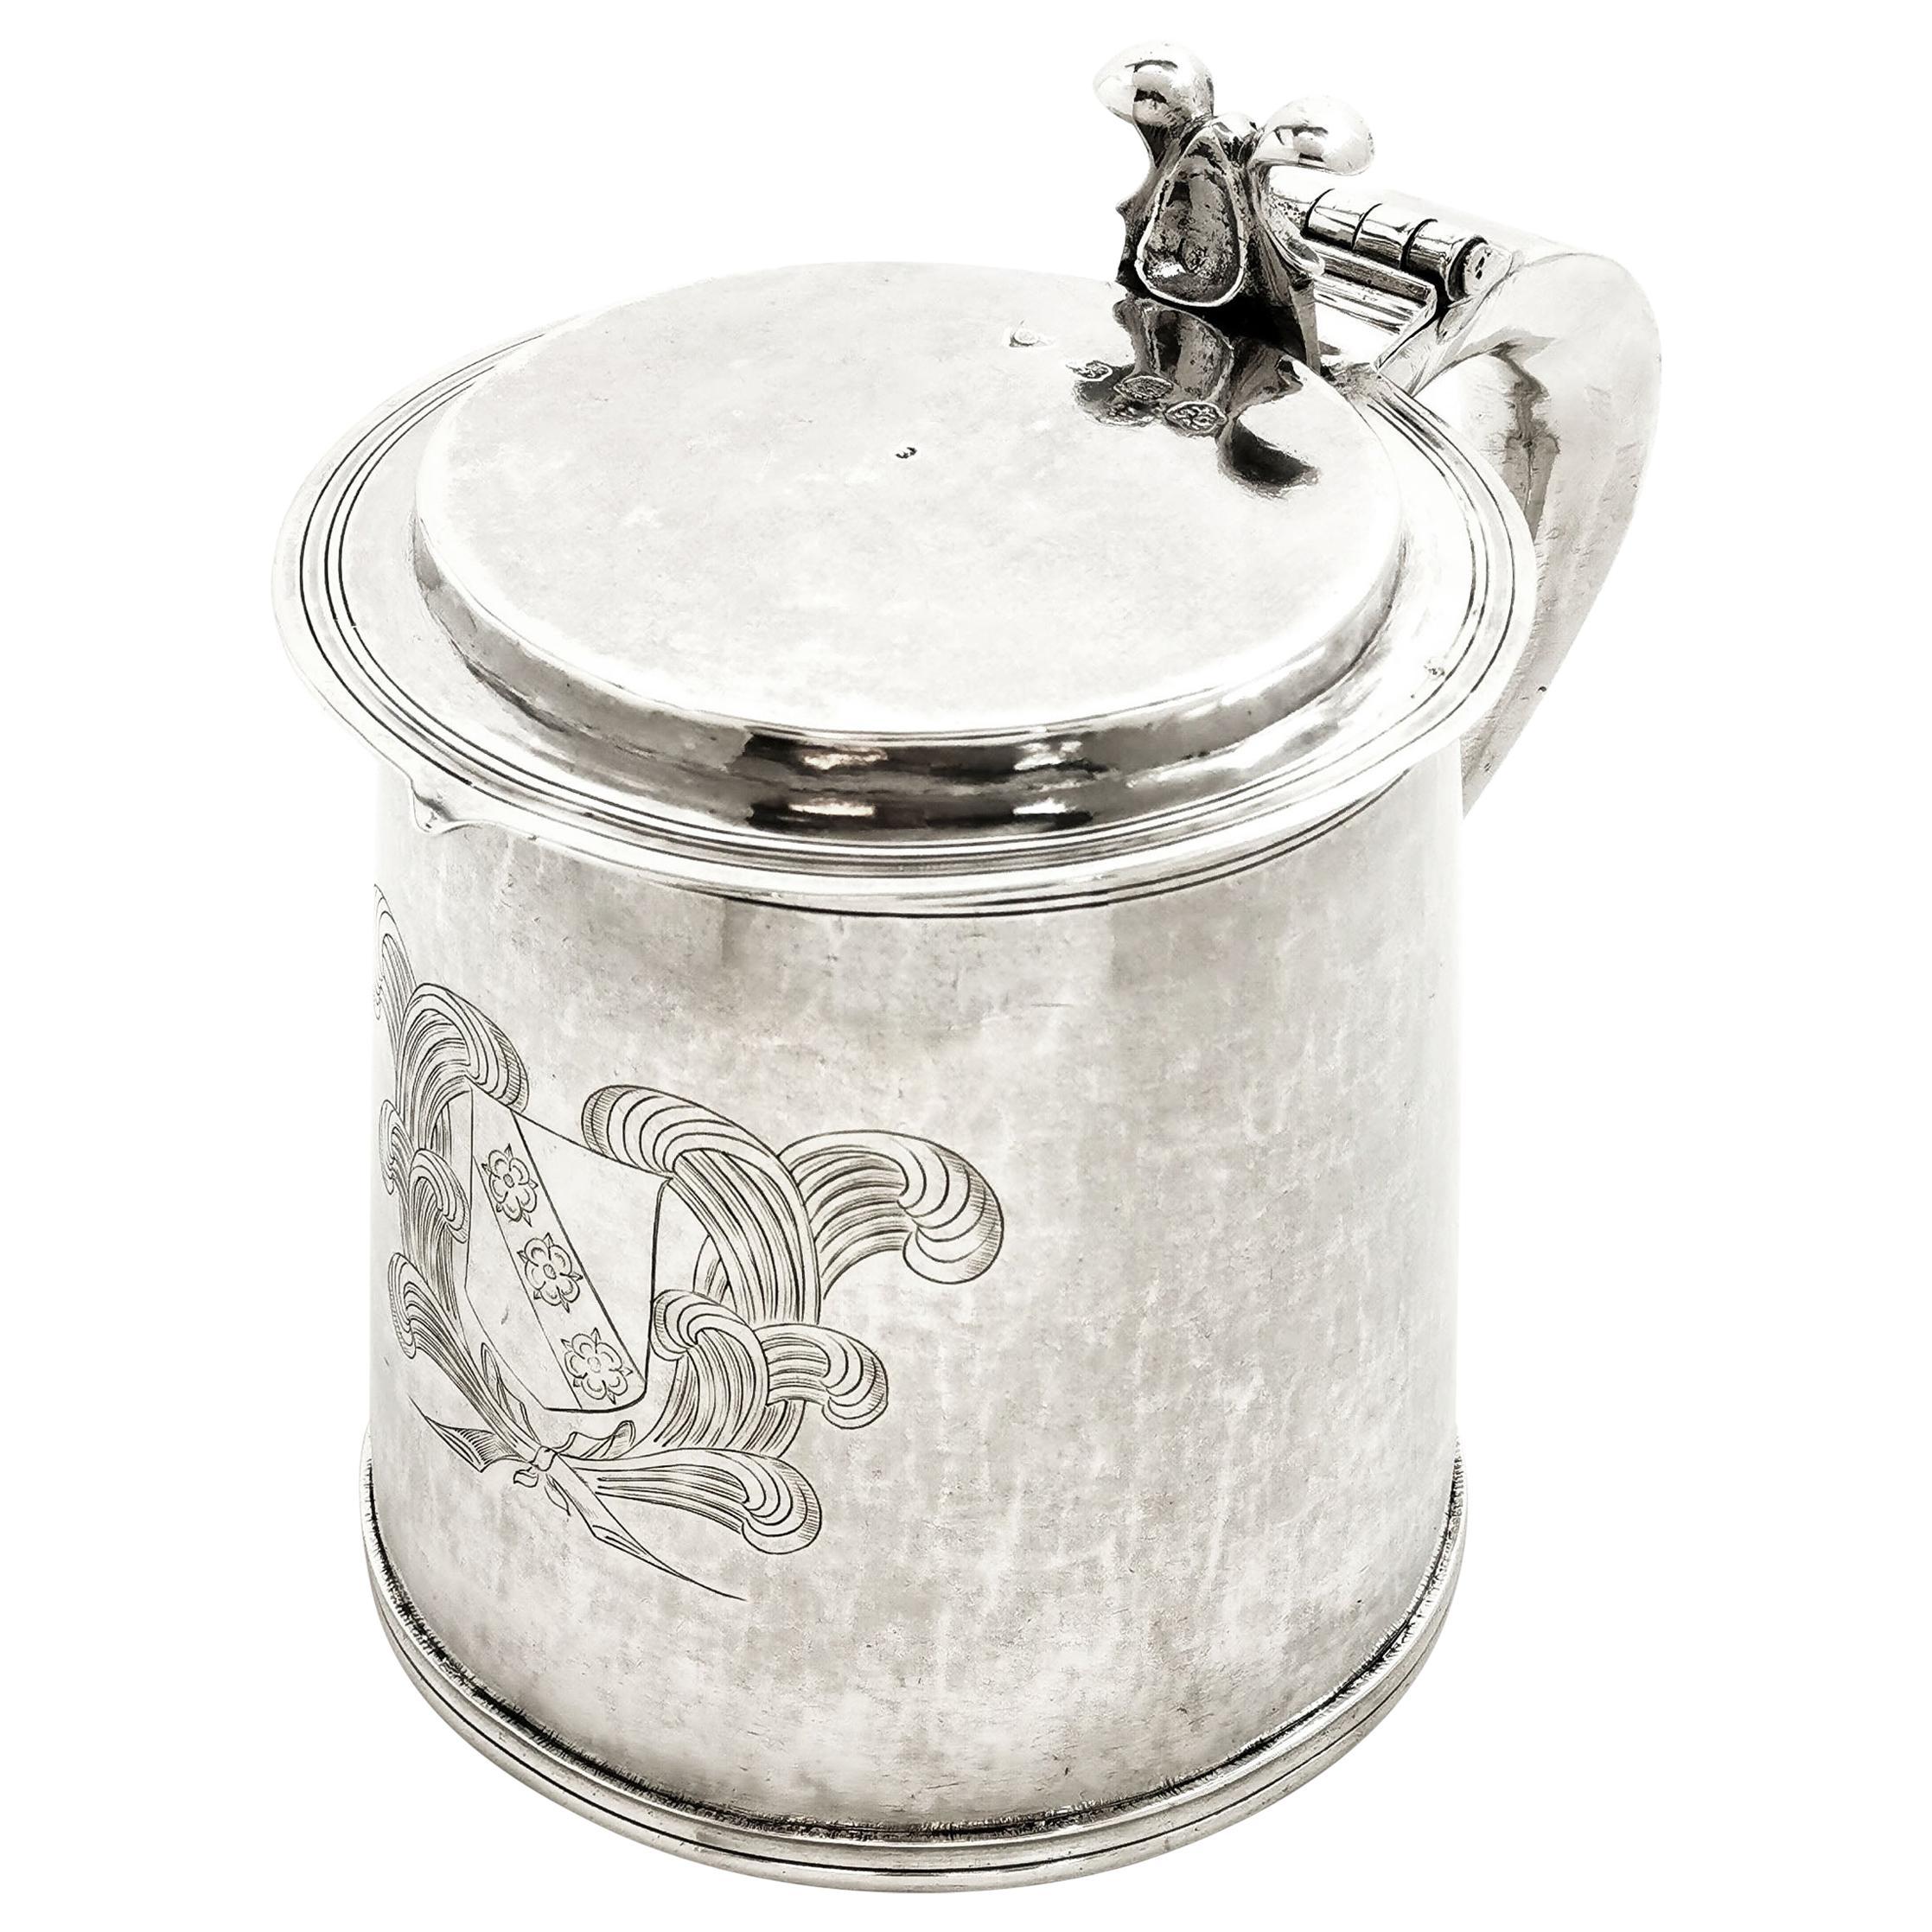 Antique Silver Charles II Lidded Tankard Mug 1673 17th Century Beer Ale Tankard